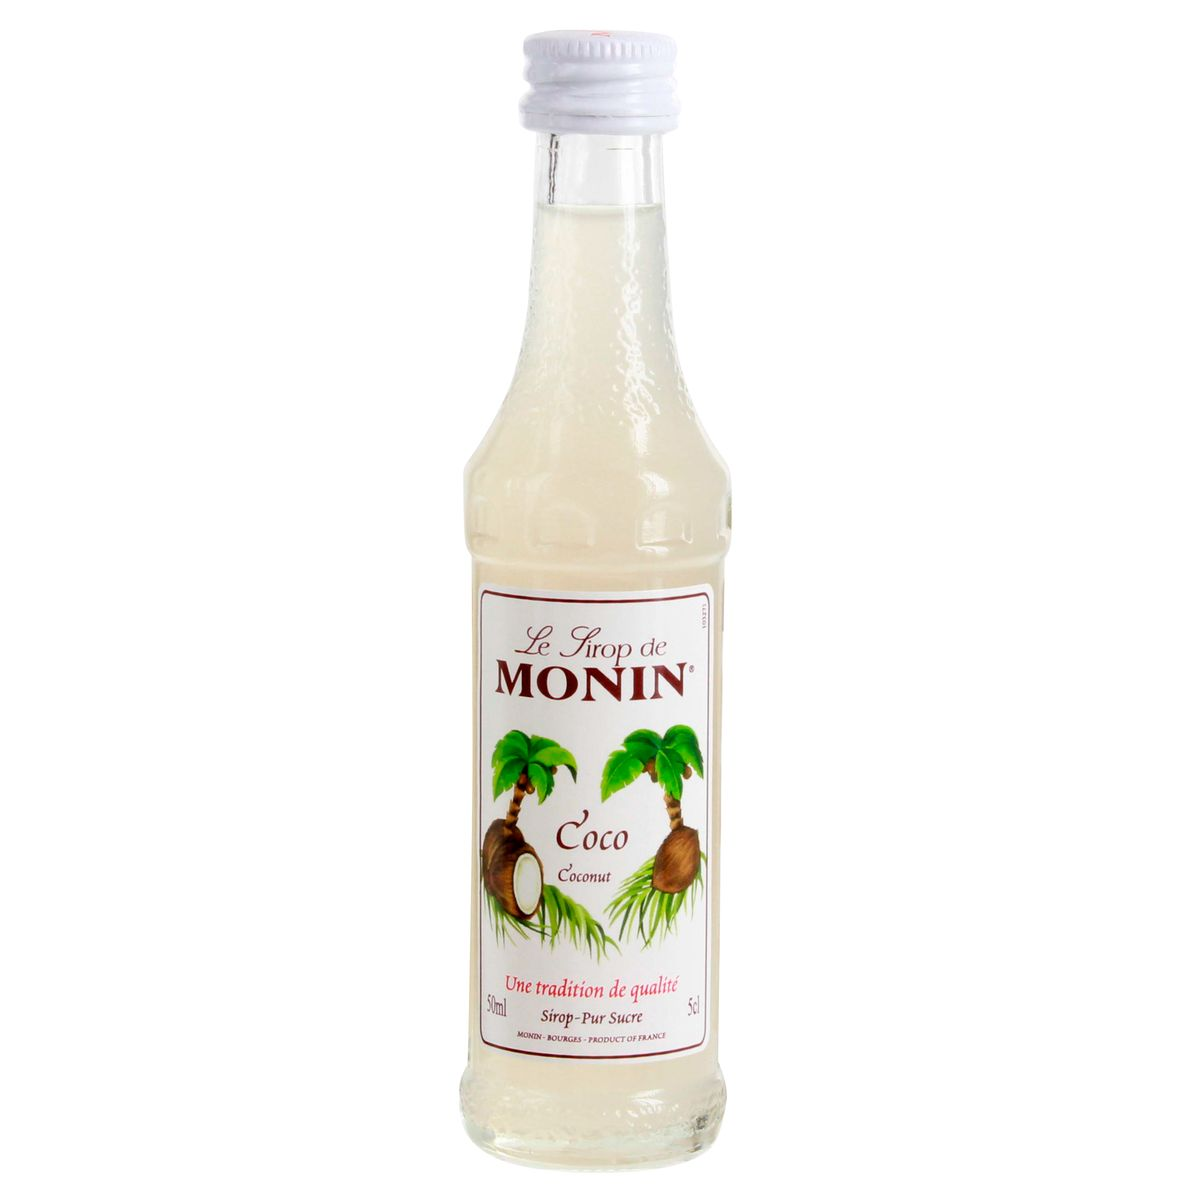 Mignonette sirop Monin - coco - Monin